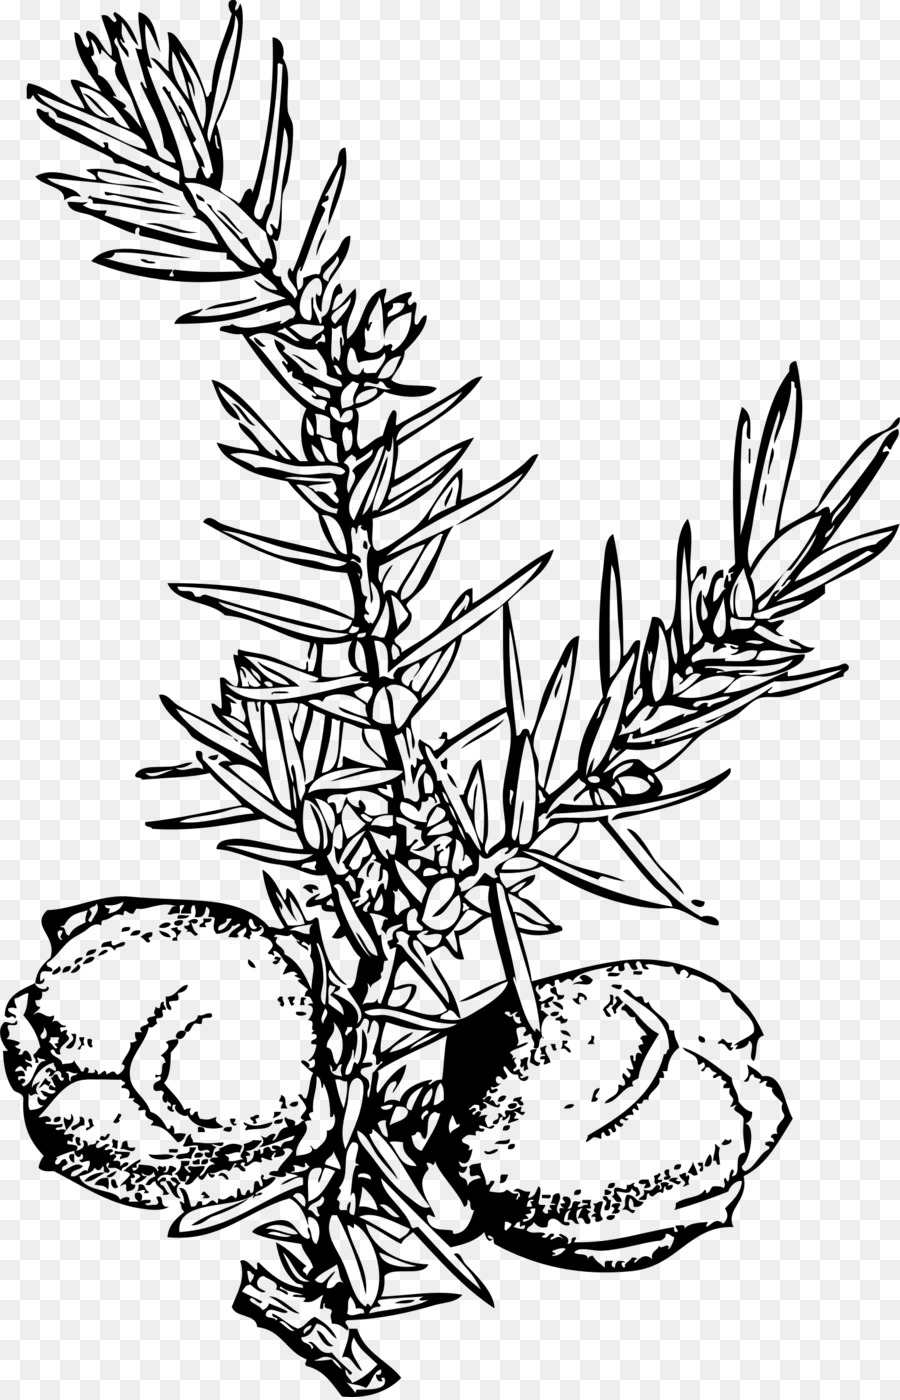 Drawing clip art leaf. Blueberry clipart juniper berry